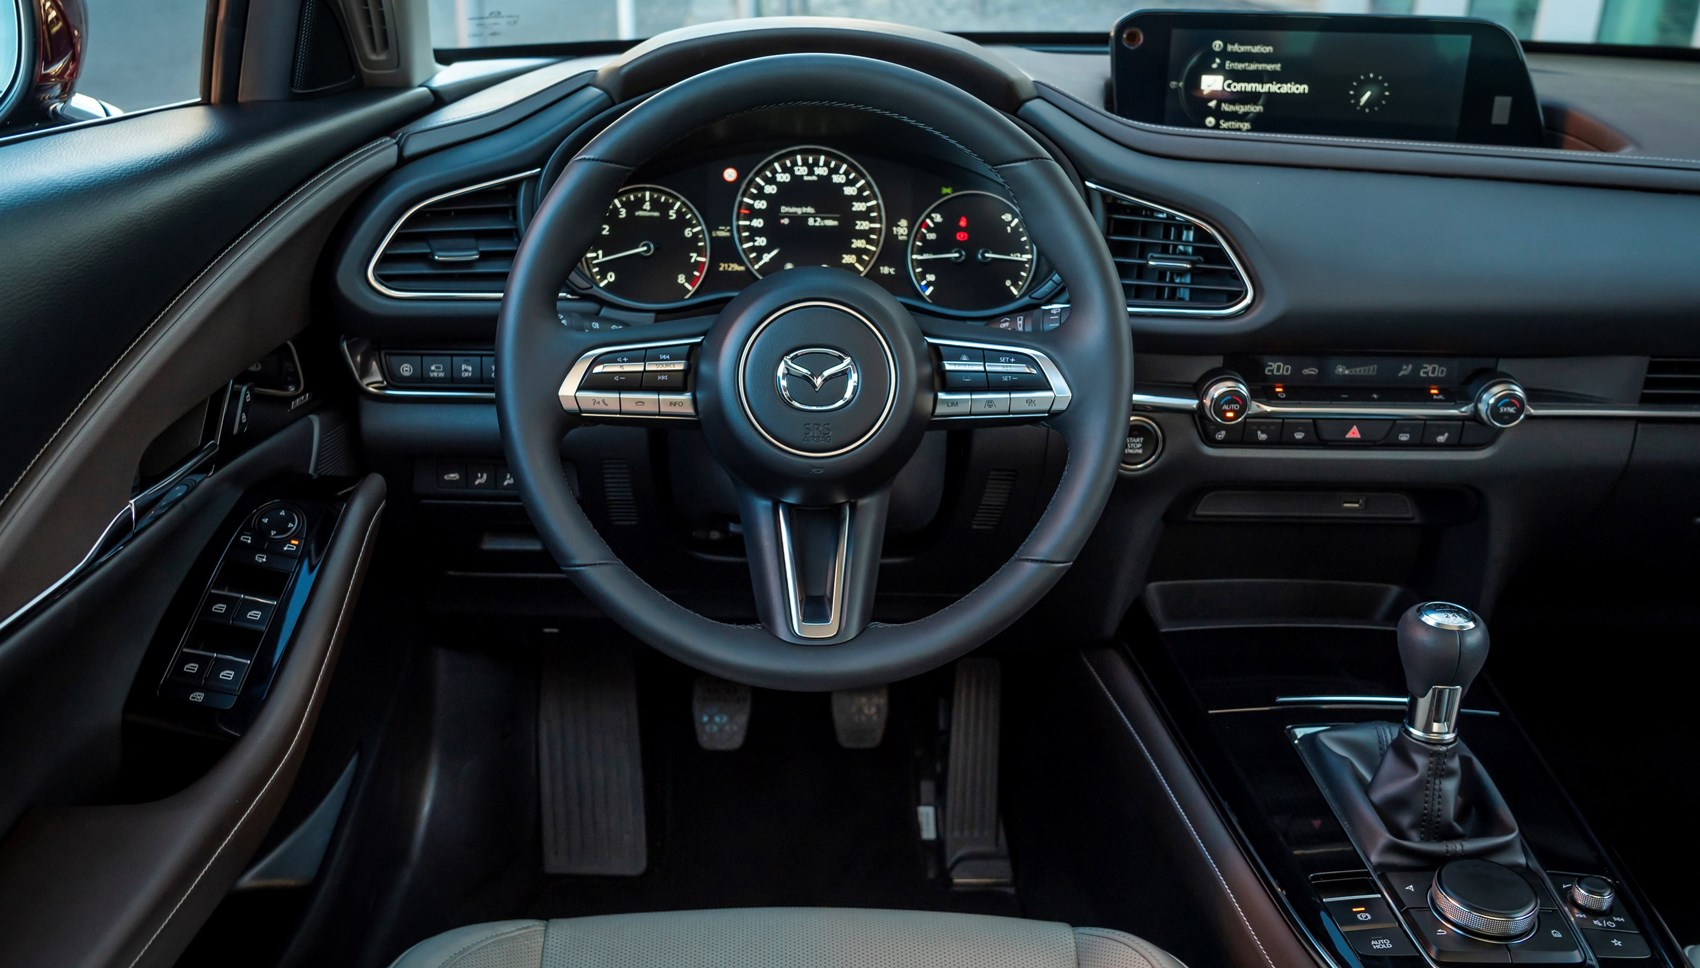 Kekurangan Mazda C30 Spesifikasi